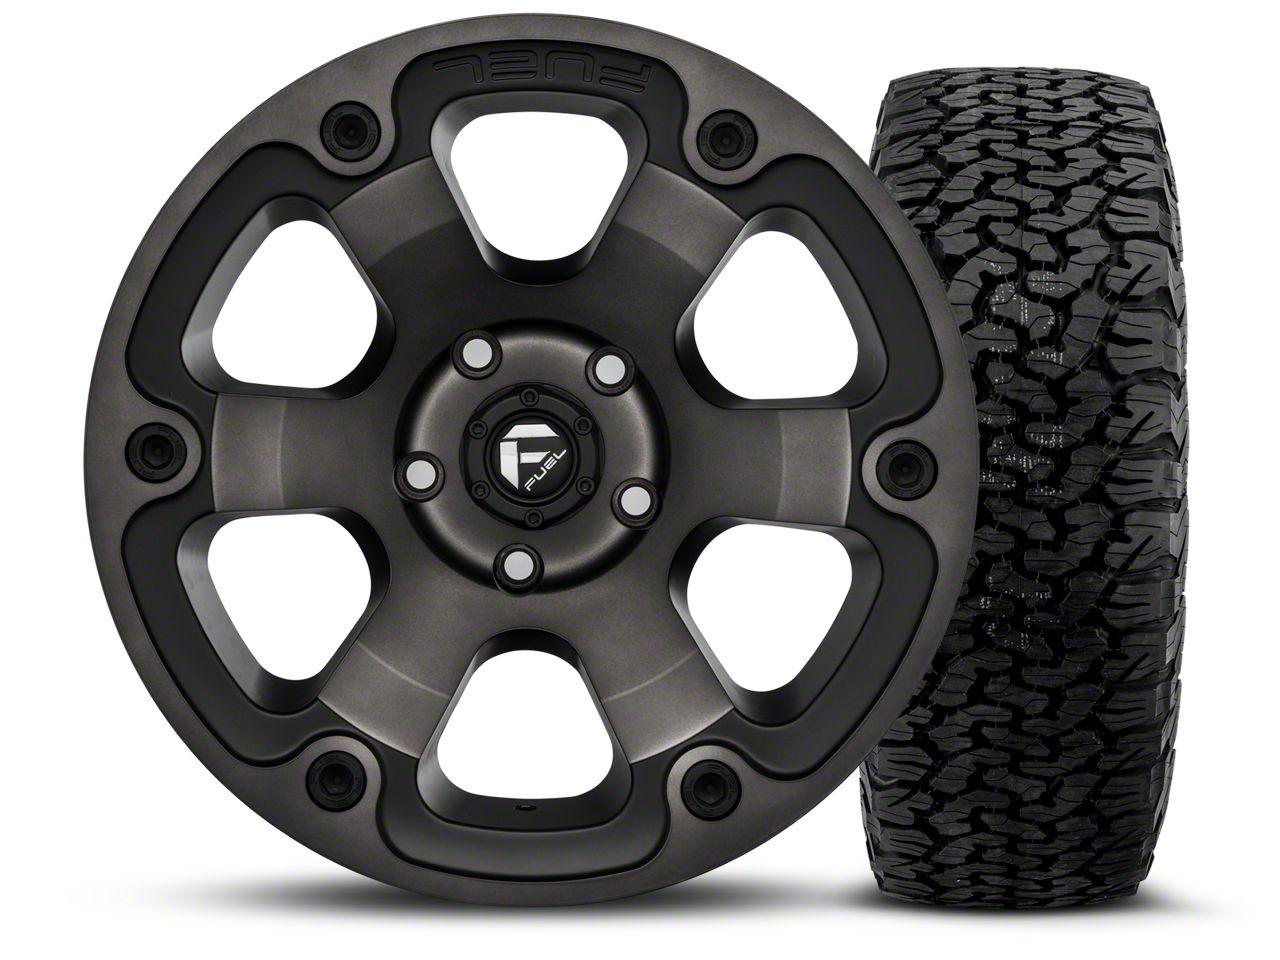 Fuel Wheels Beast Black Machined - 17x9 Wheel - and BF Goodrich All Terrain TA KO2 Tire - 315/70R17 (07-18 Jeep Wrangler JK)